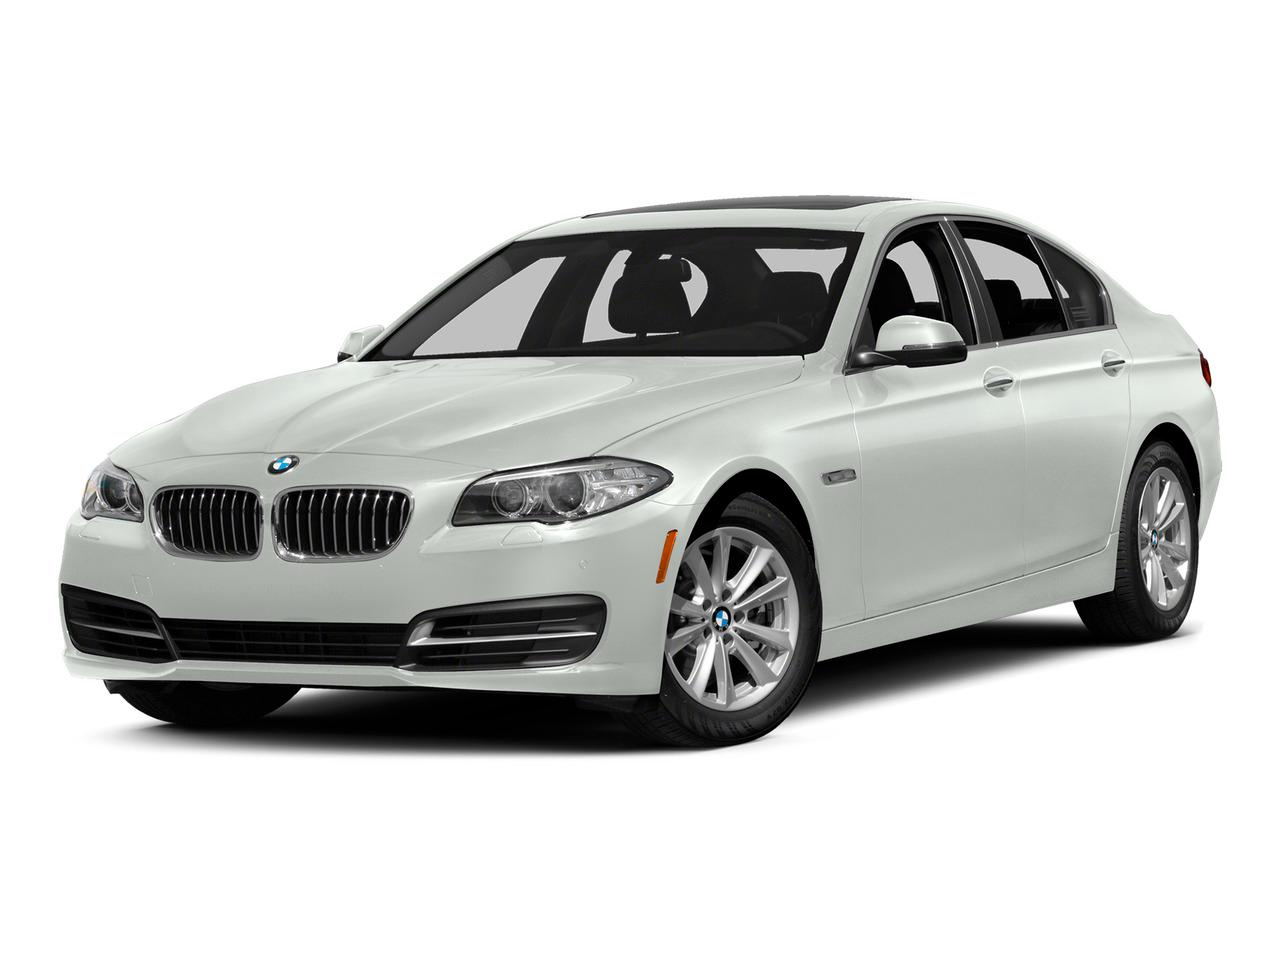 2015 BMW 528i Vehicle Photo in HOUSTON, TX 77002